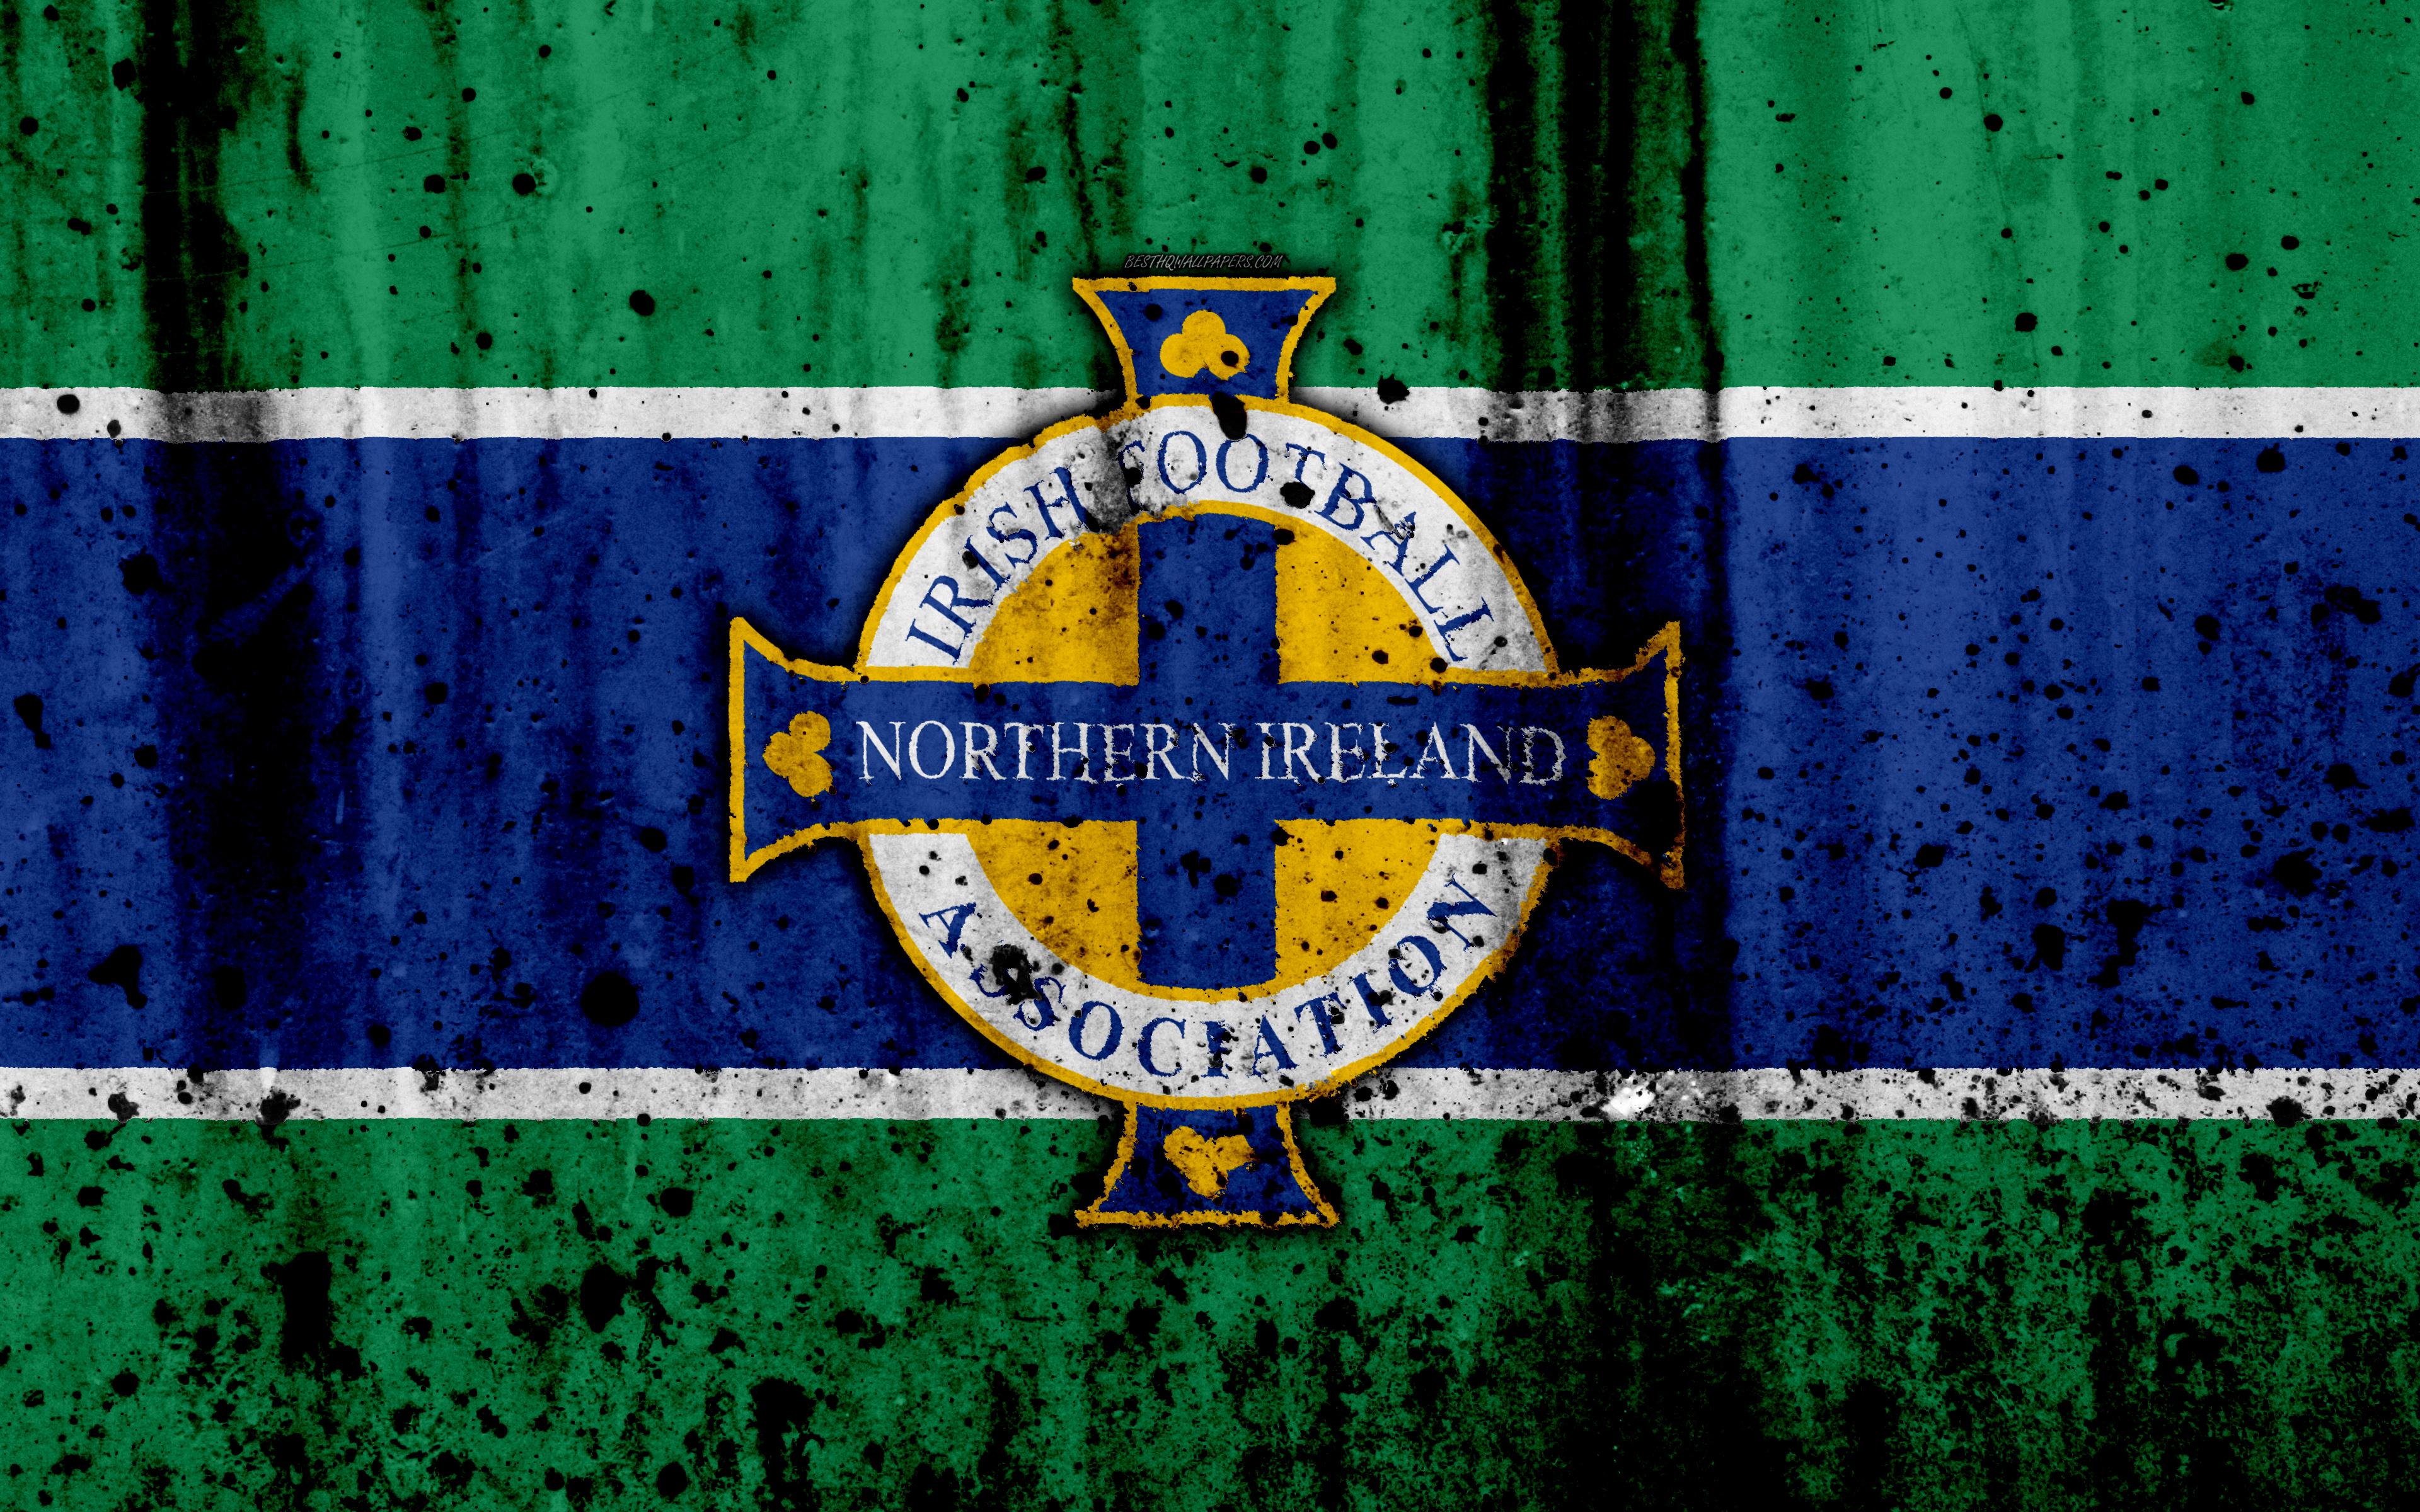 Download wallpapers Northern Ireland national football team 4k 3840x2400